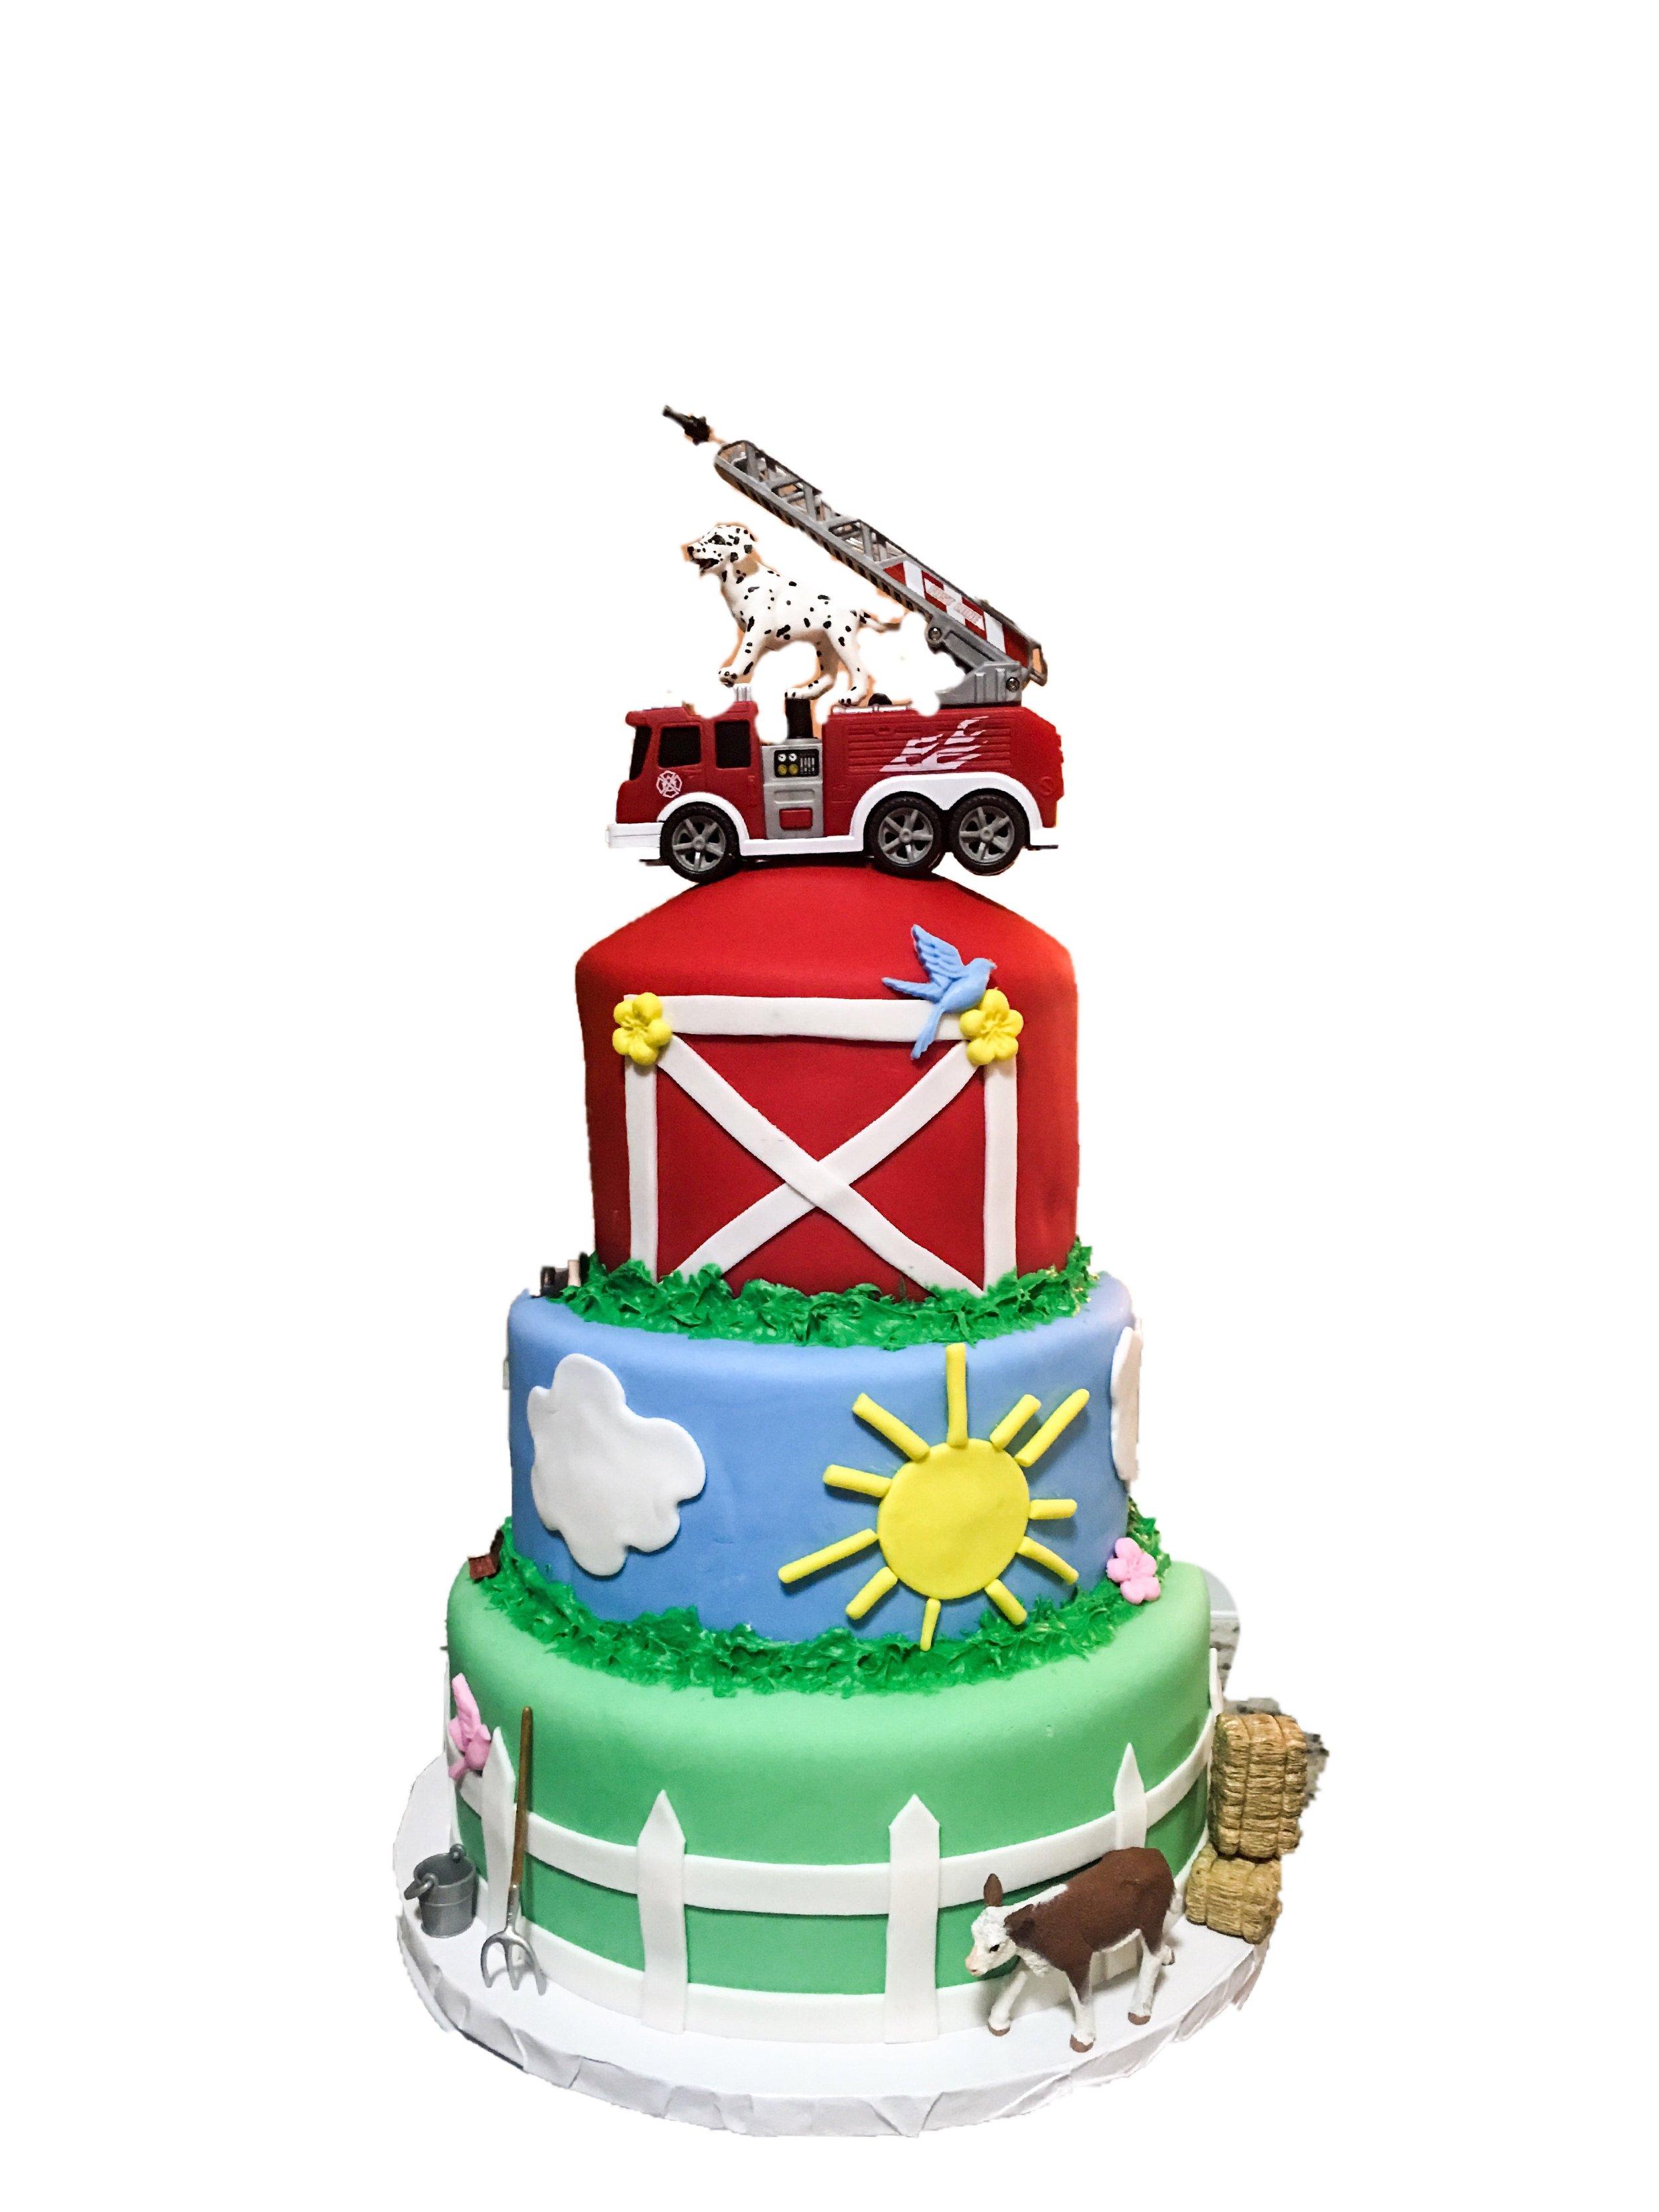 Custom Farm & Fire Truck Cake